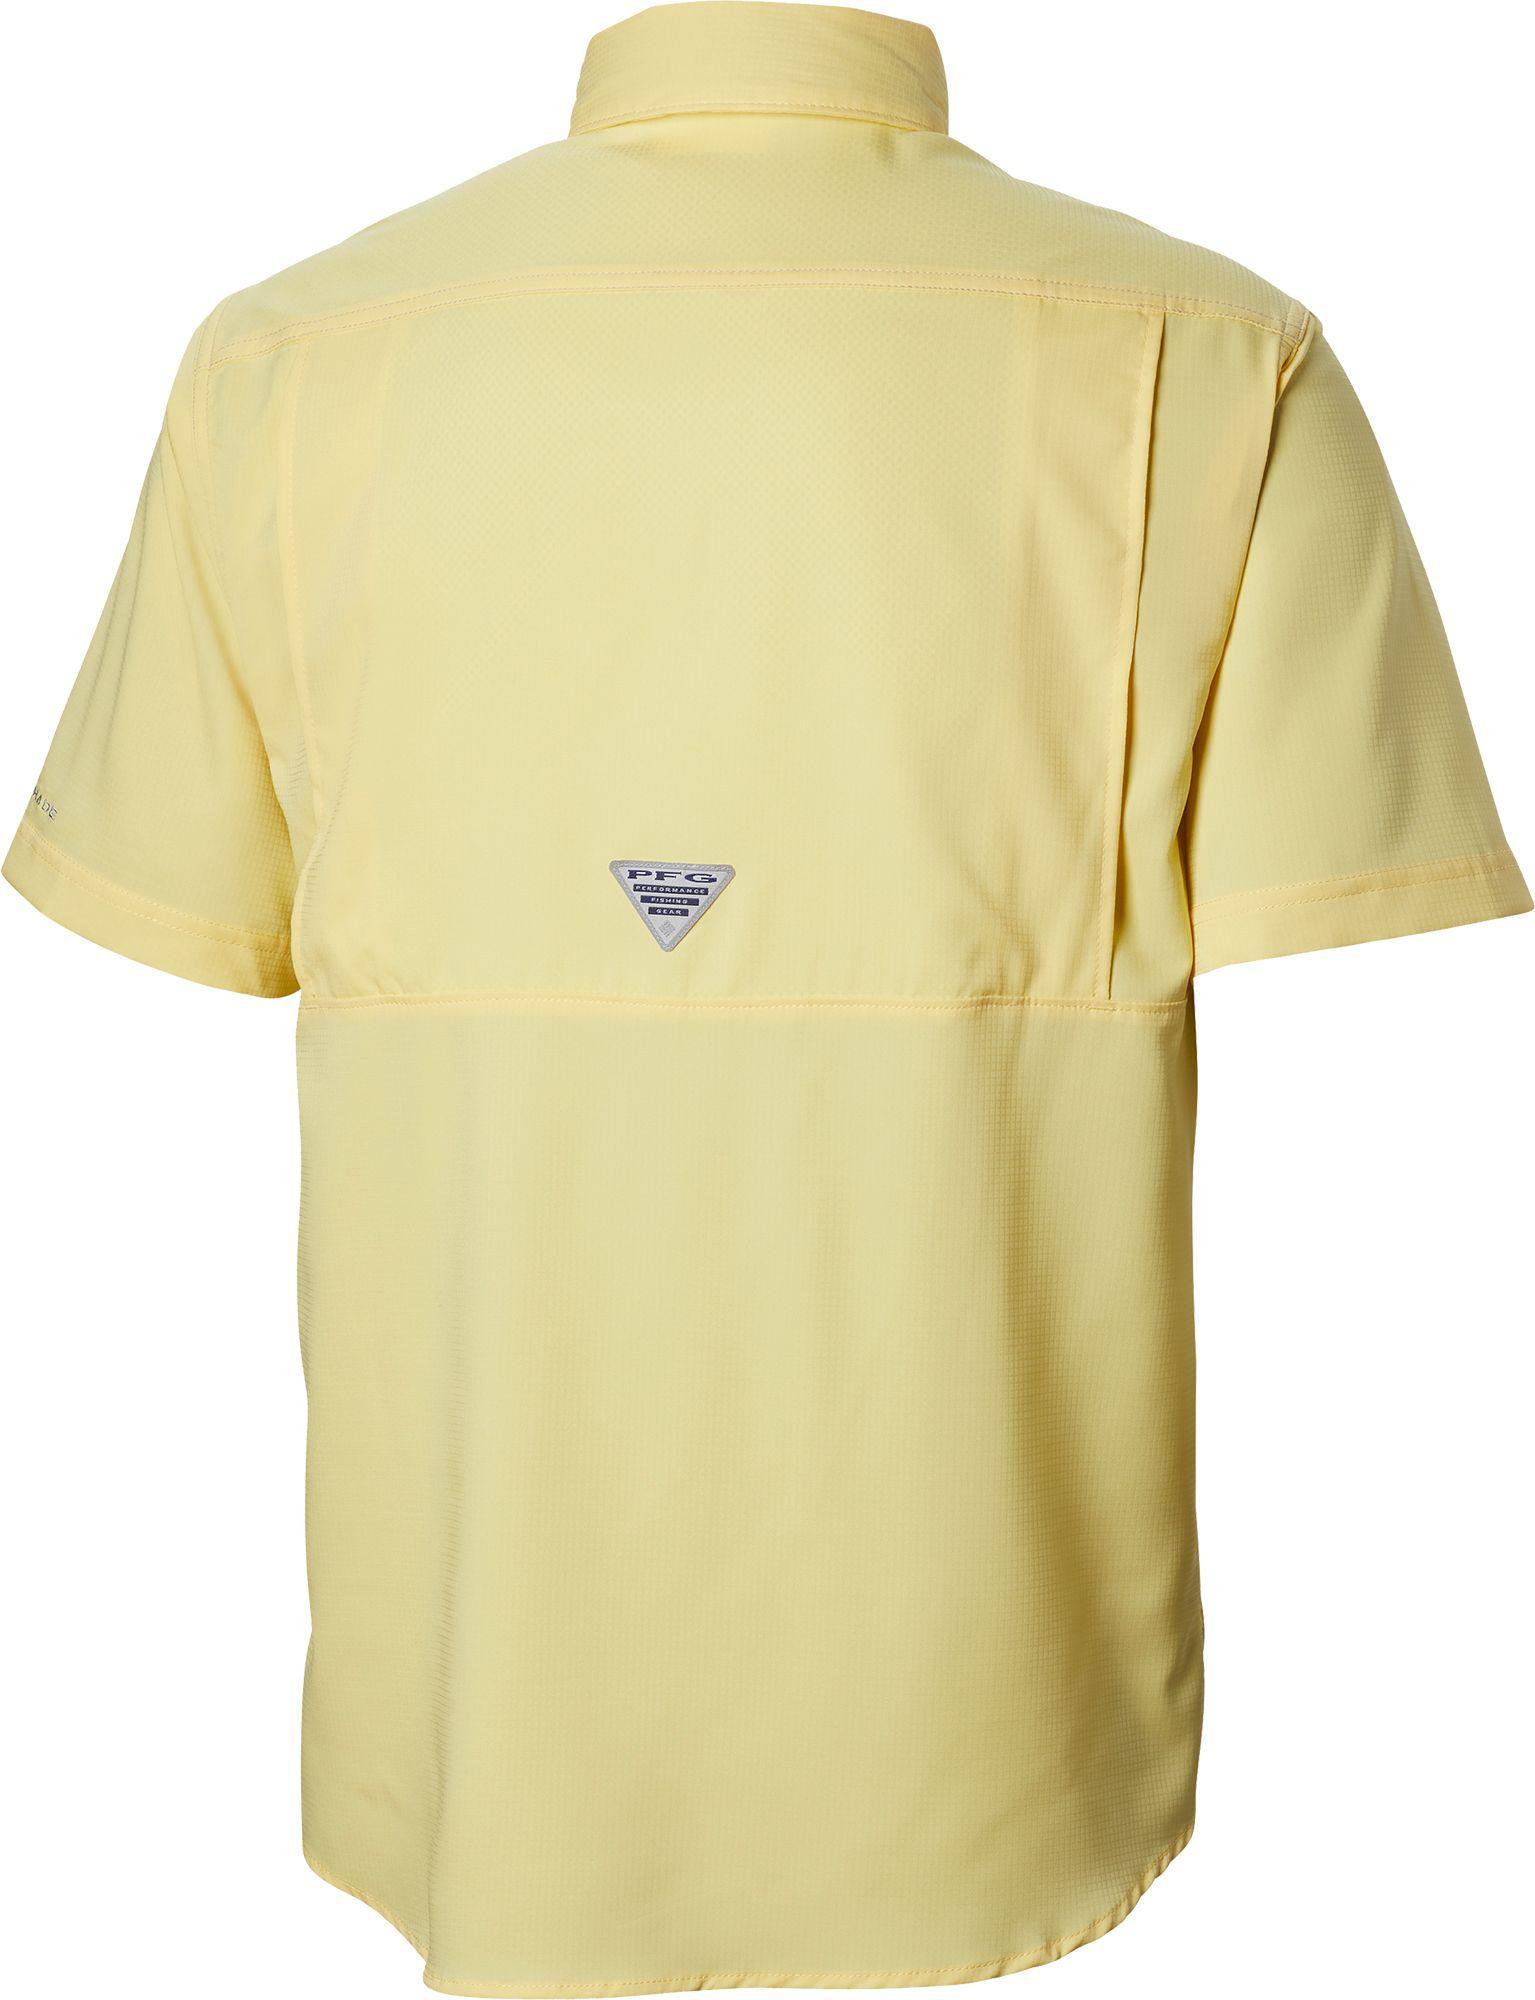 2082636ad9a Columbia - Yellow Pfg Low Drag Offshore Short Sleeve Shirt for Men - Lyst.  View fullscreen